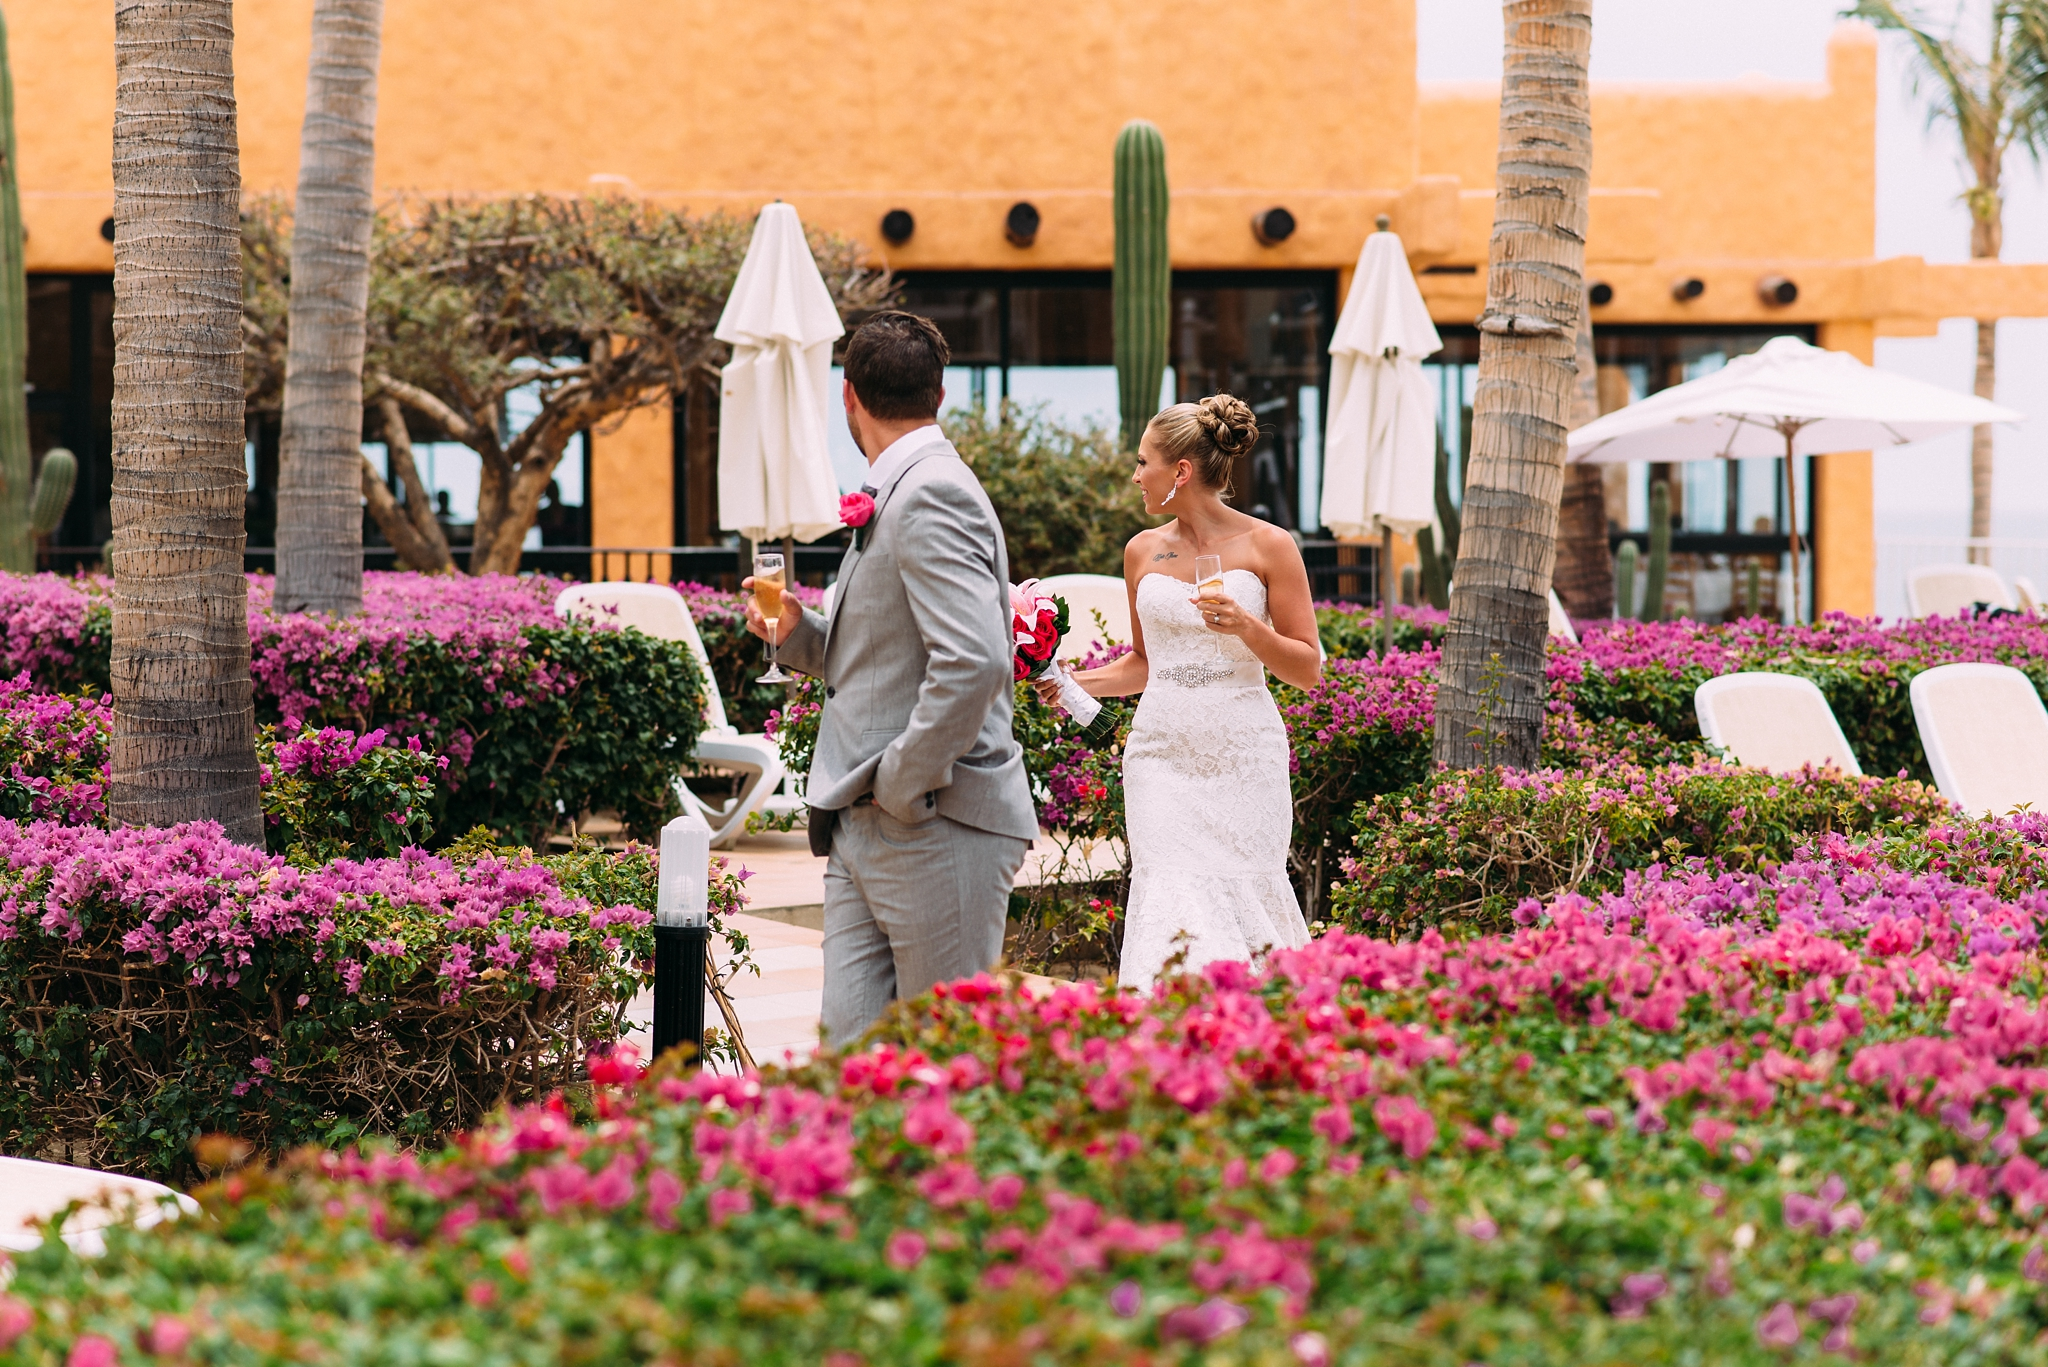 kaihla_tonai_intimate_wedding_elopement_photographer_1353